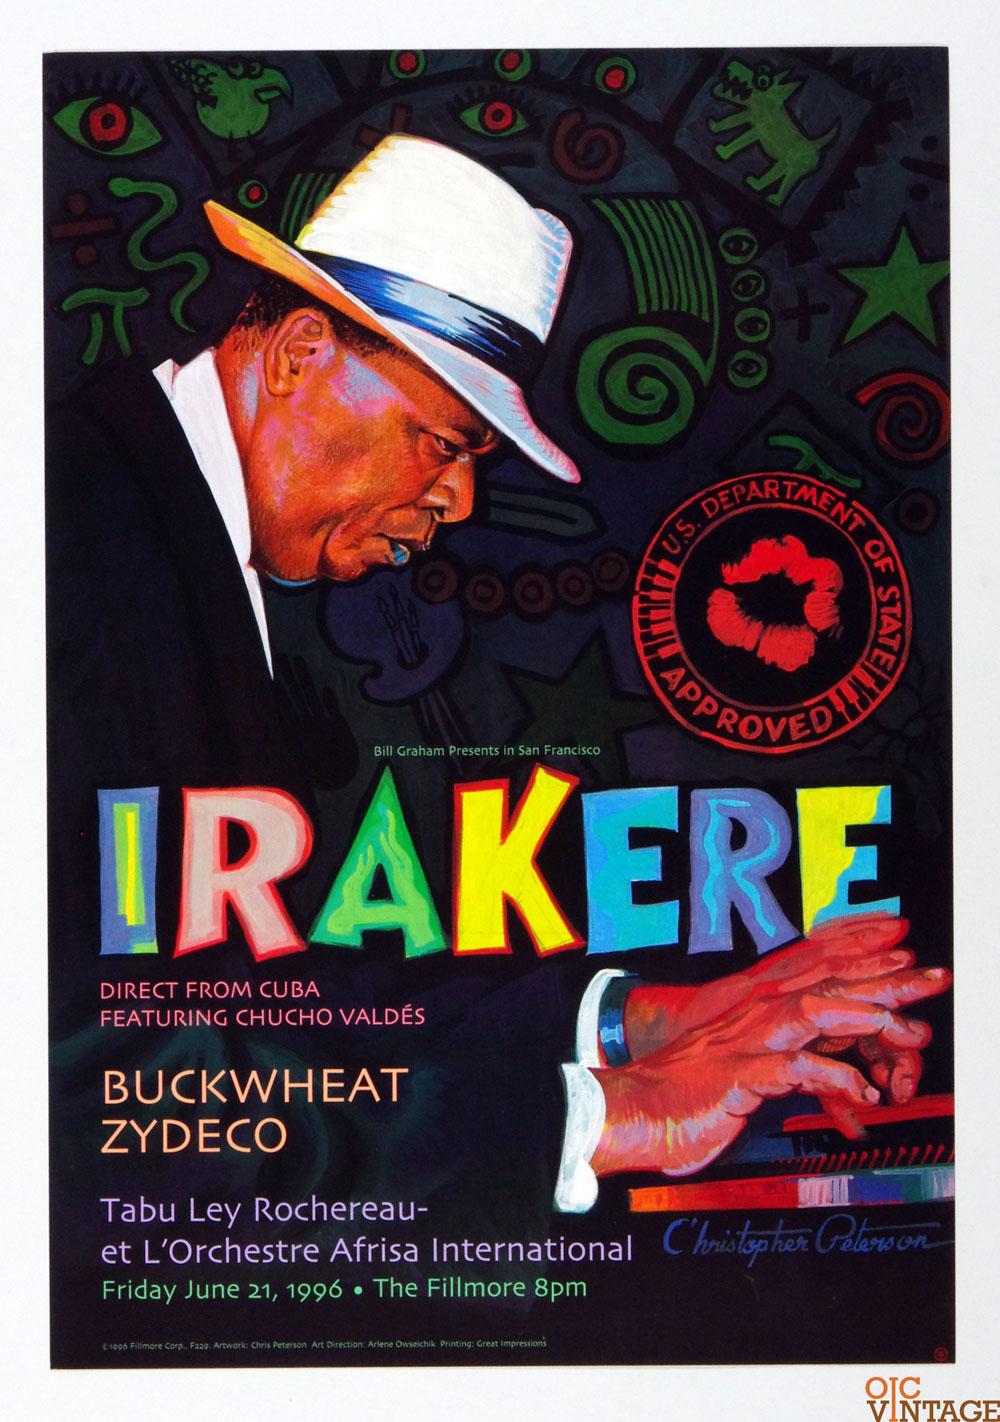 Bill Graham Presents Poster 1996 Jun 21 Irakere Chucho Valdes #229